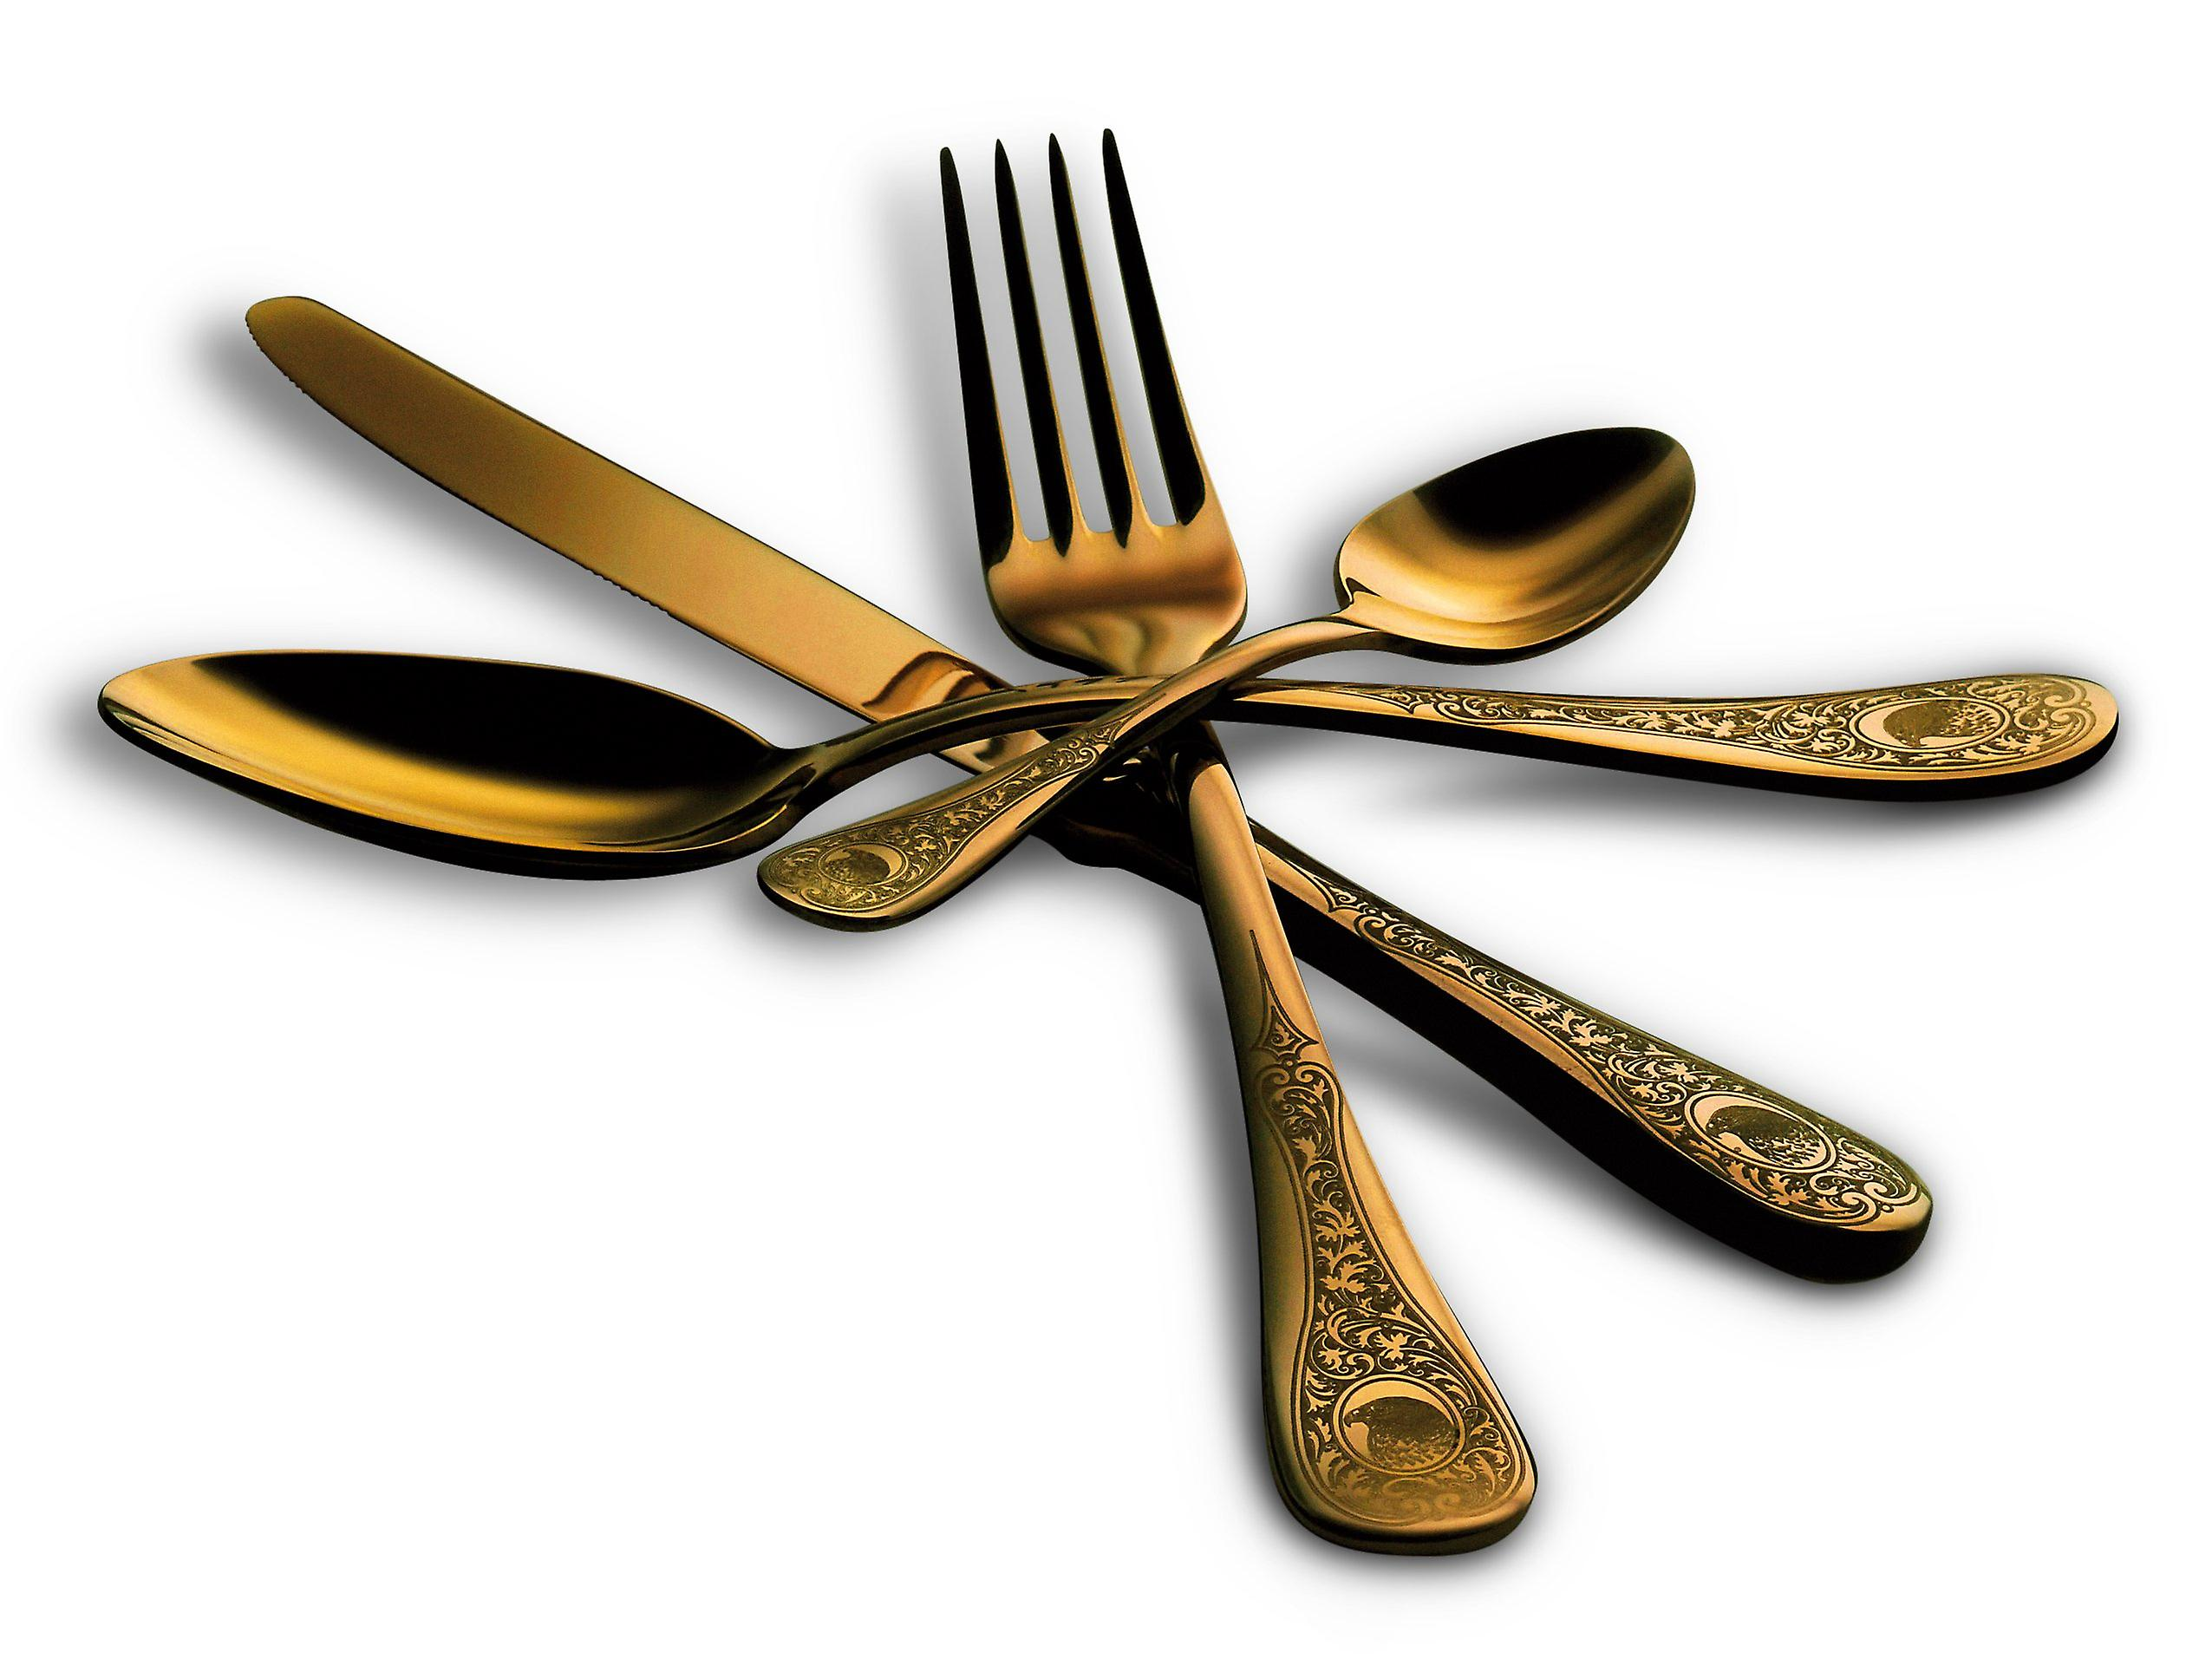 Mepra Diana Oro 5 pcs flatware set